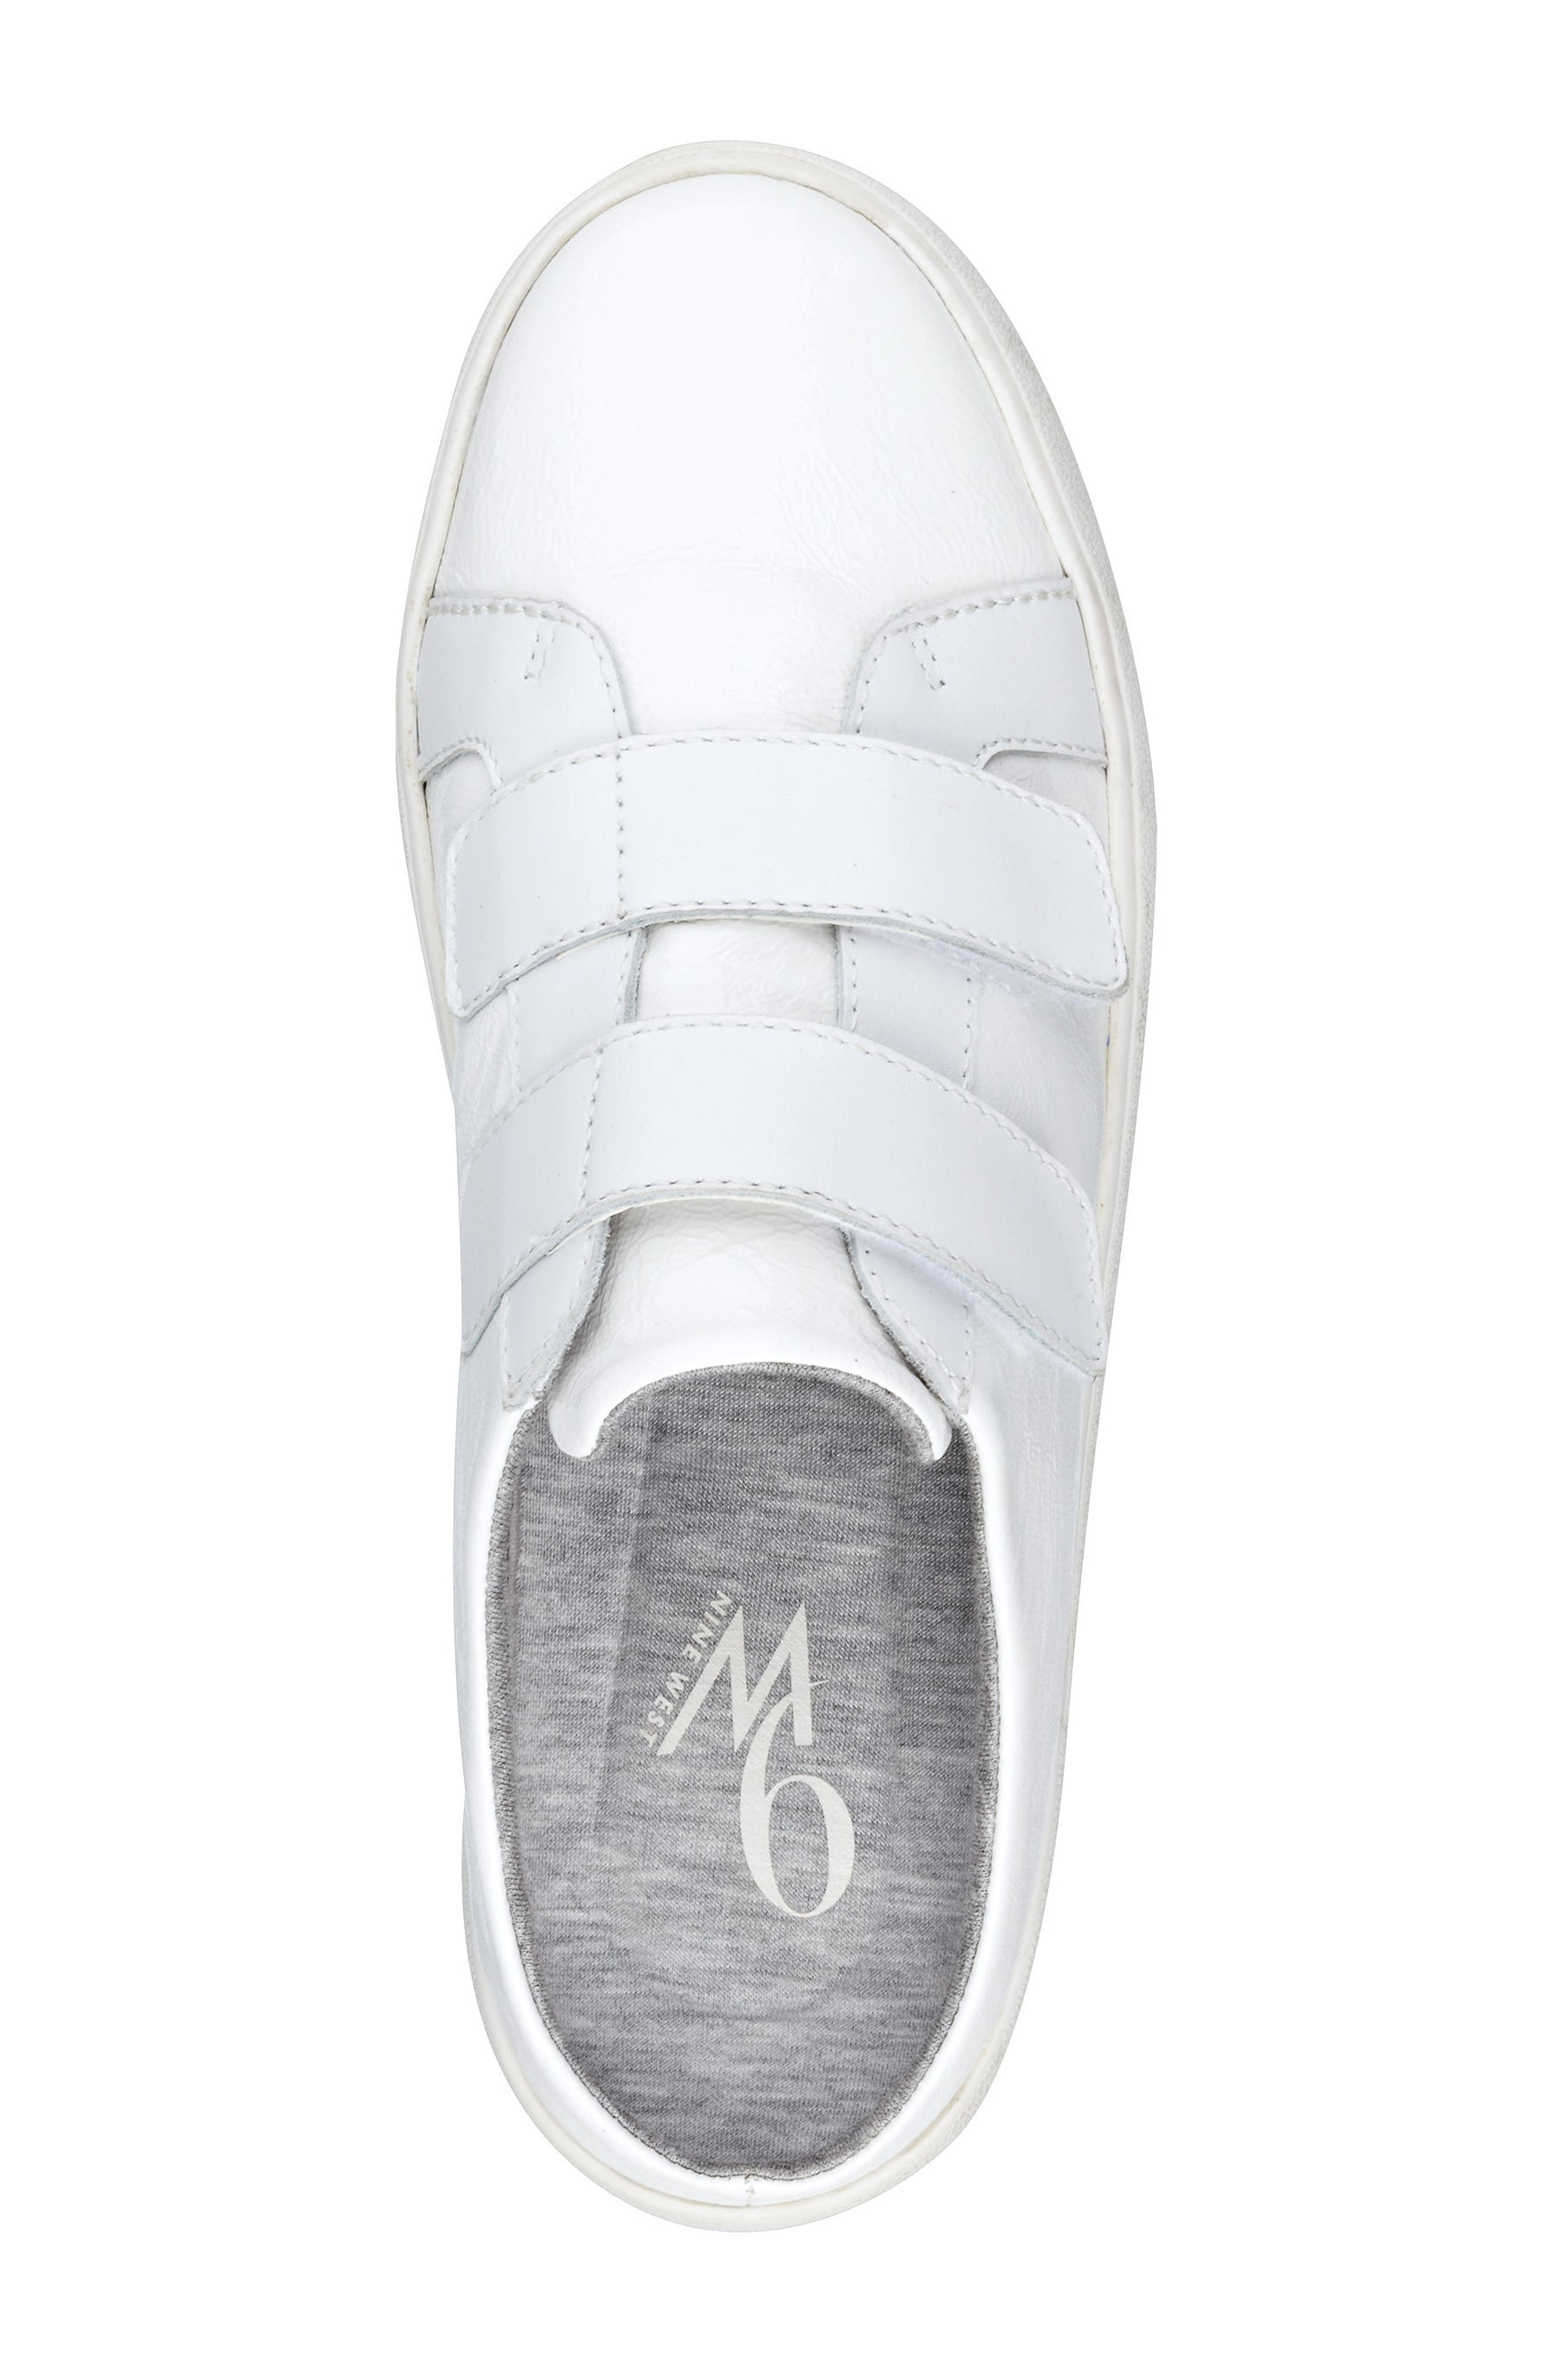 Poeton Sneaker Mule,                             Alternate thumbnail 10, color,